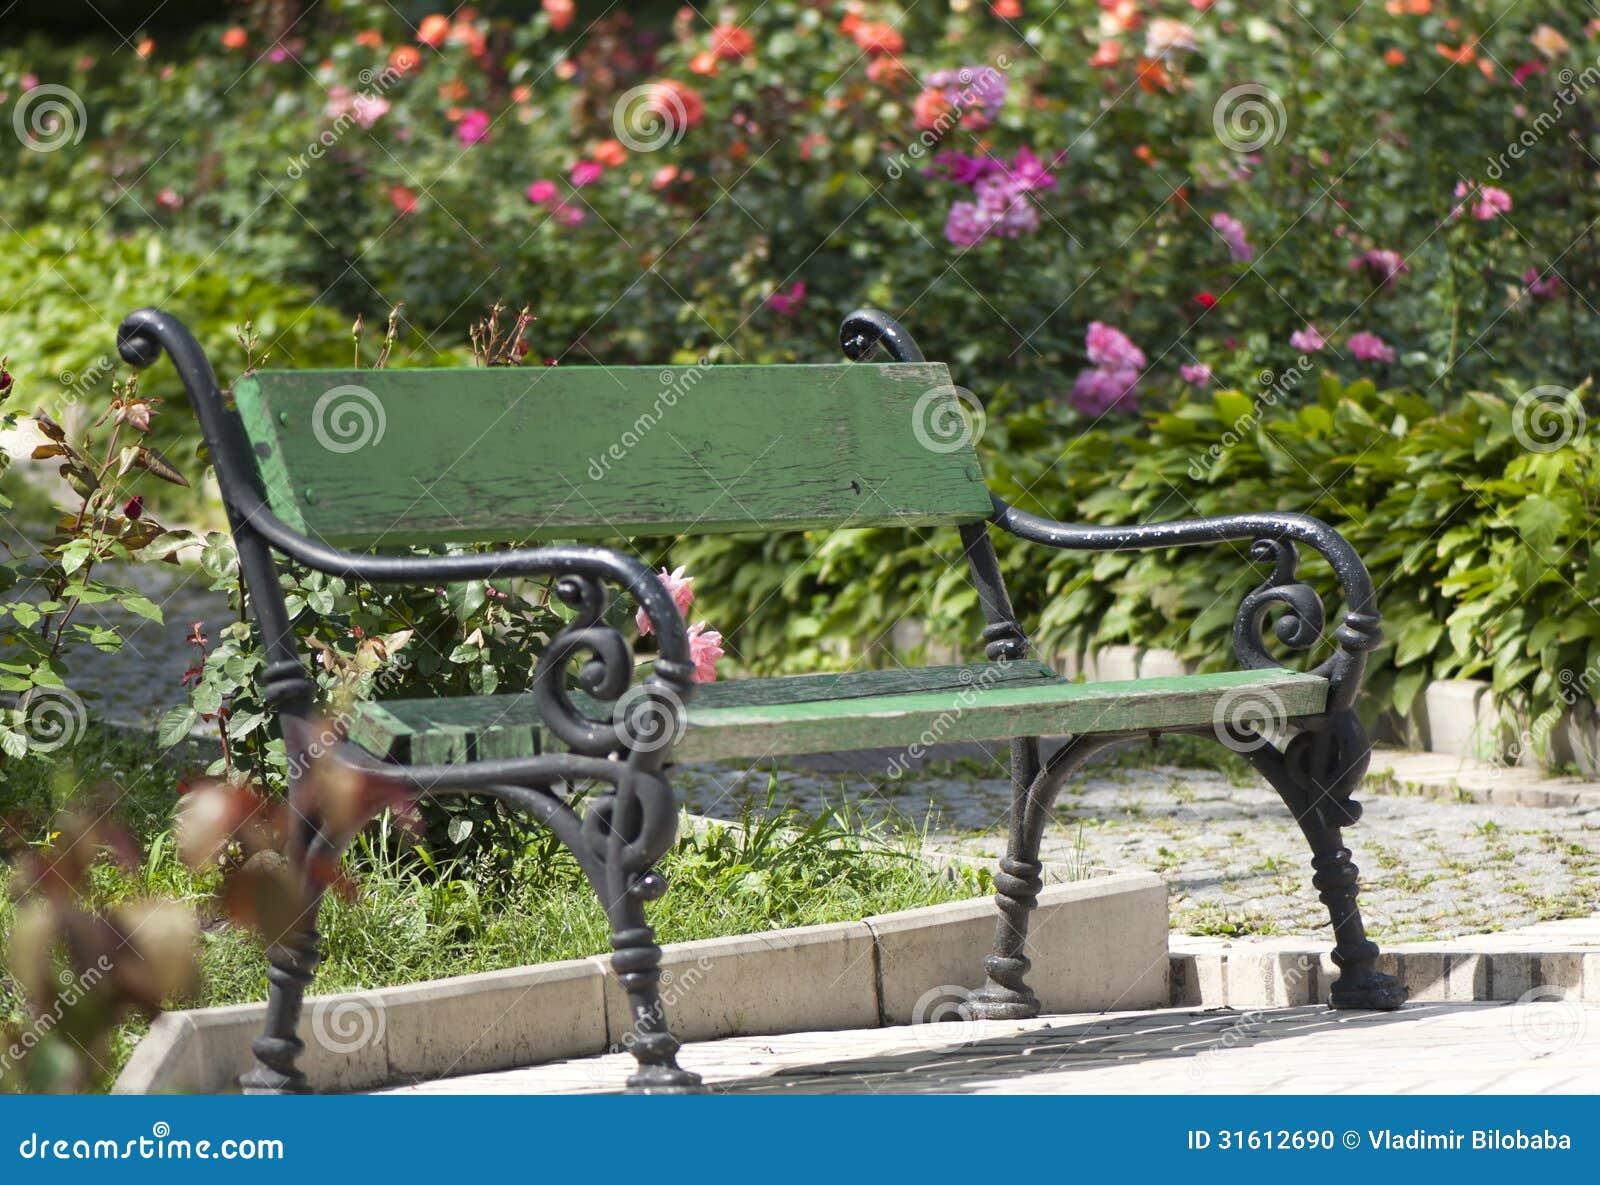 Astonishing Wrought Iron Garden Bench Stock Photo Image Of Bench 31612690 Machost Co Dining Chair Design Ideas Machostcouk